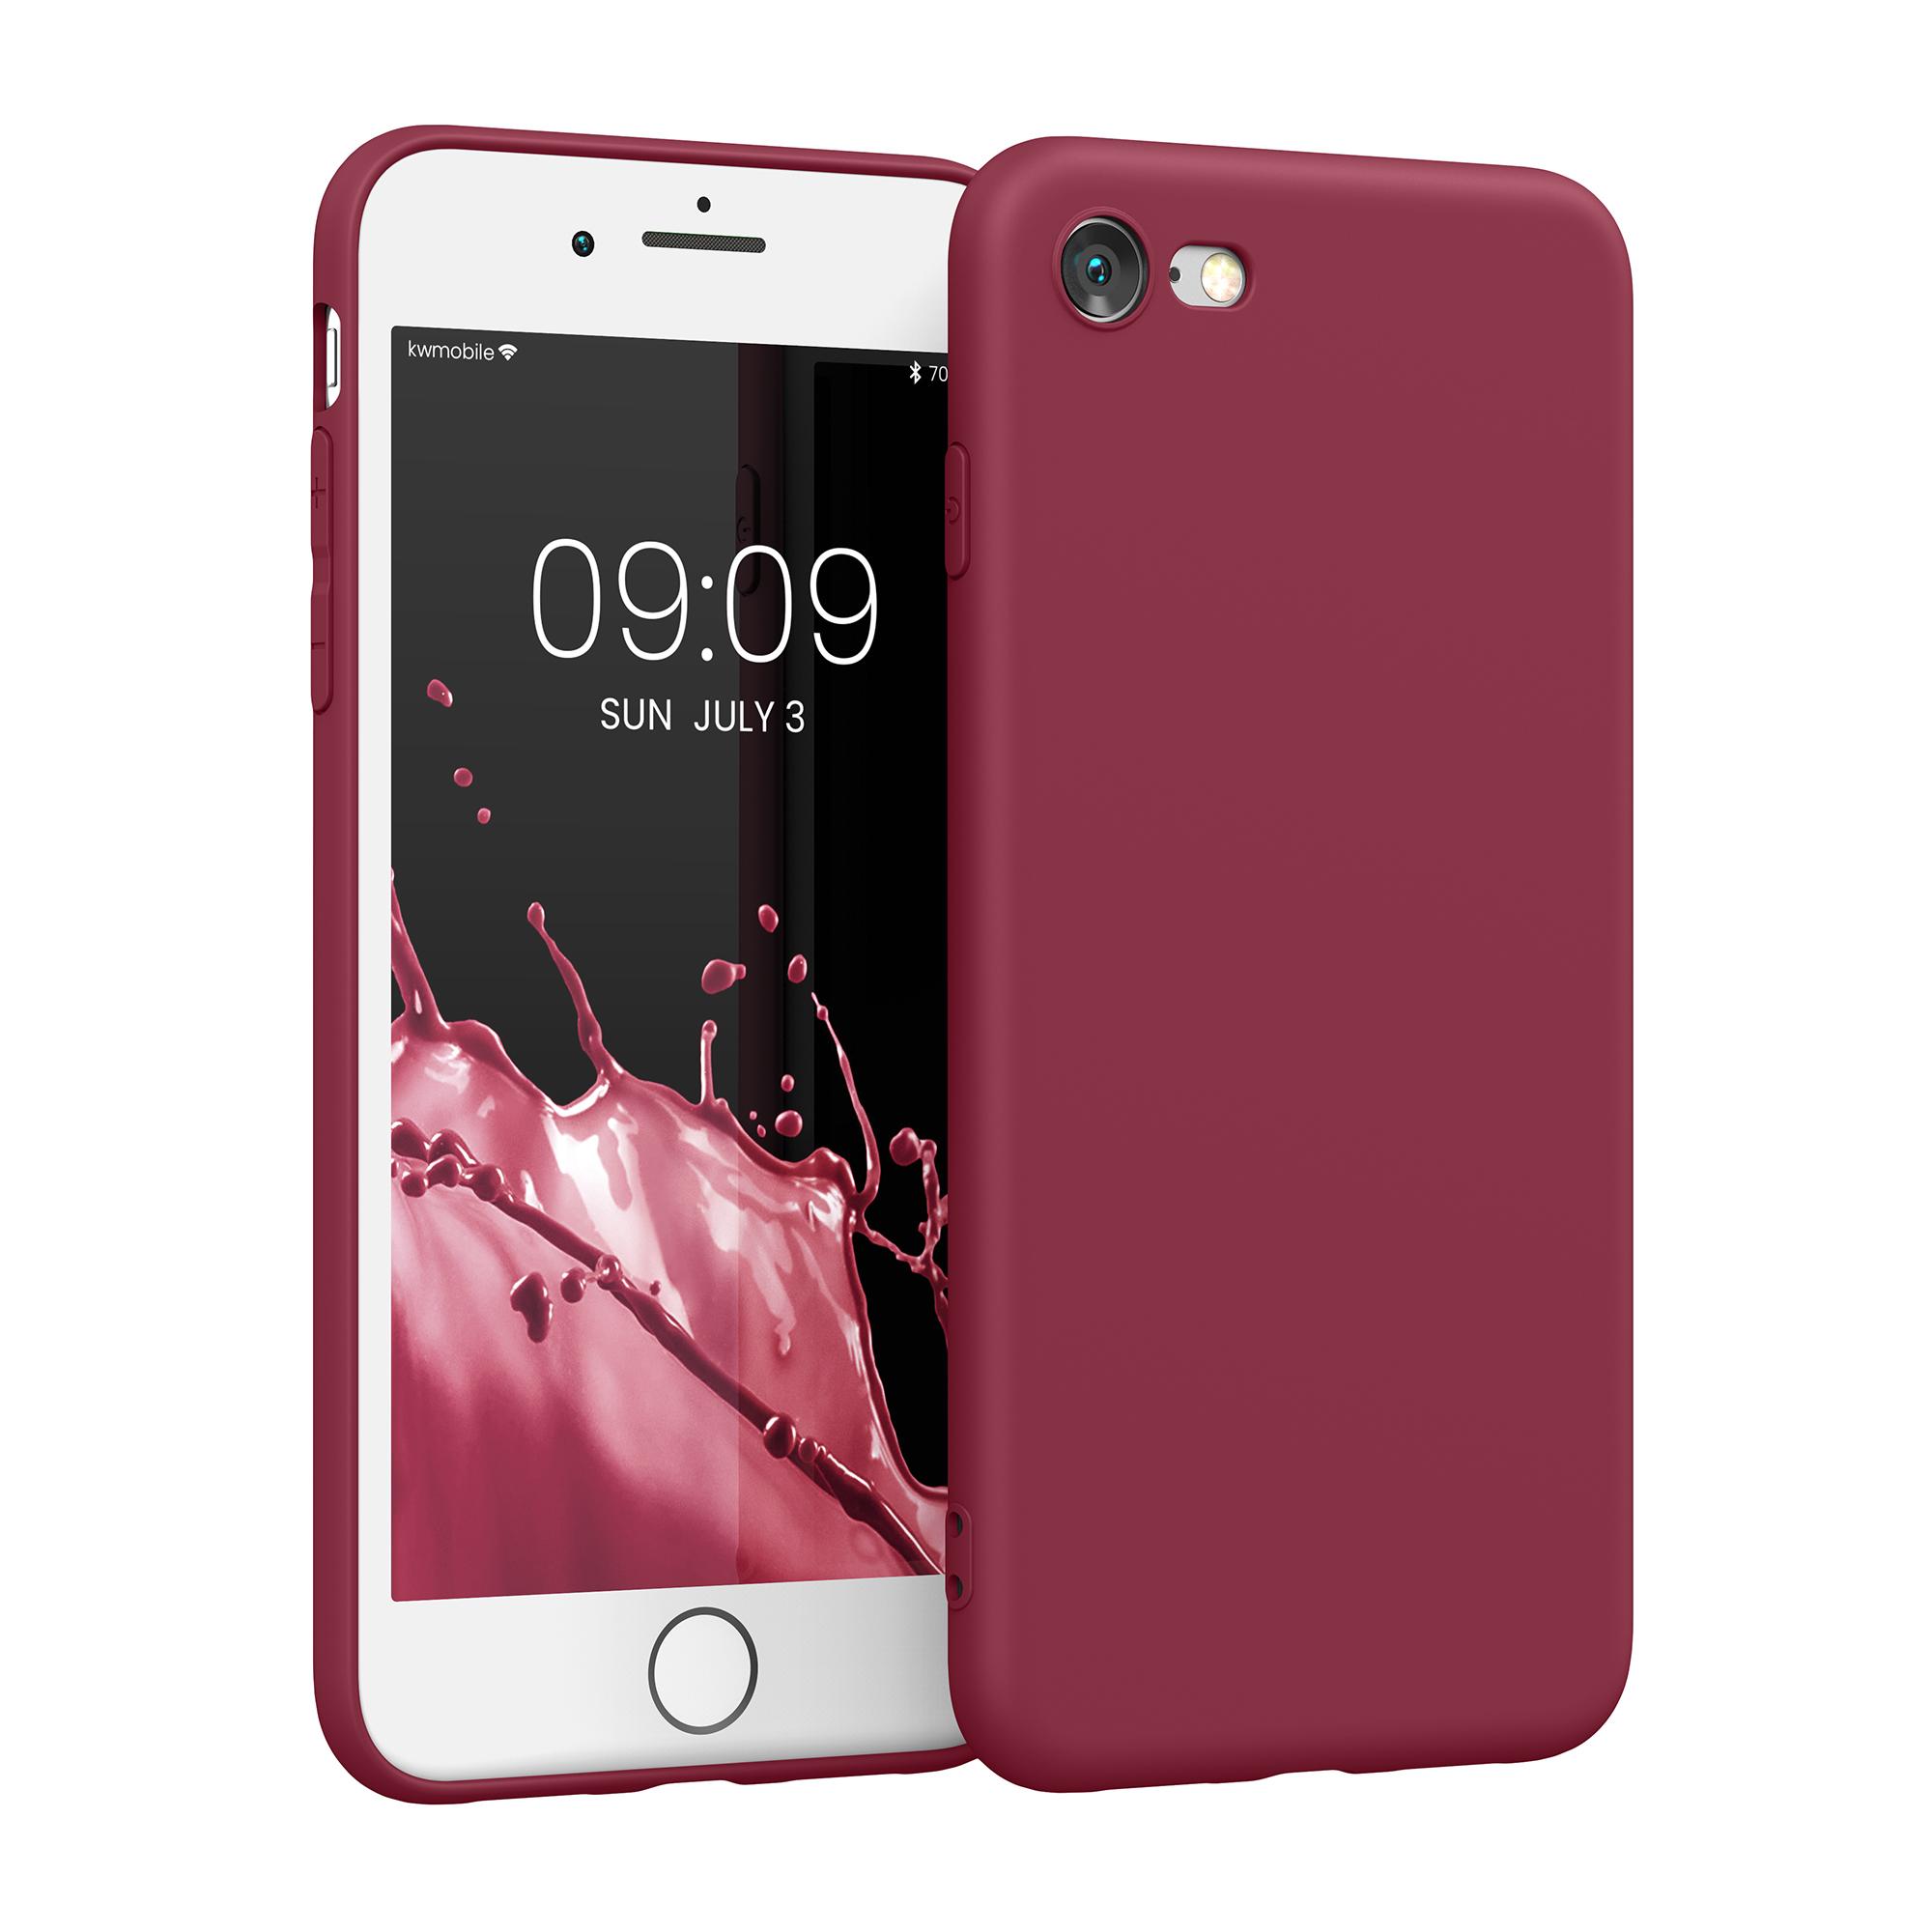 Kvalitní silikonové TPU pouzdro pro Apple iPhone 7 / 8 / SE  - rebarbora Red